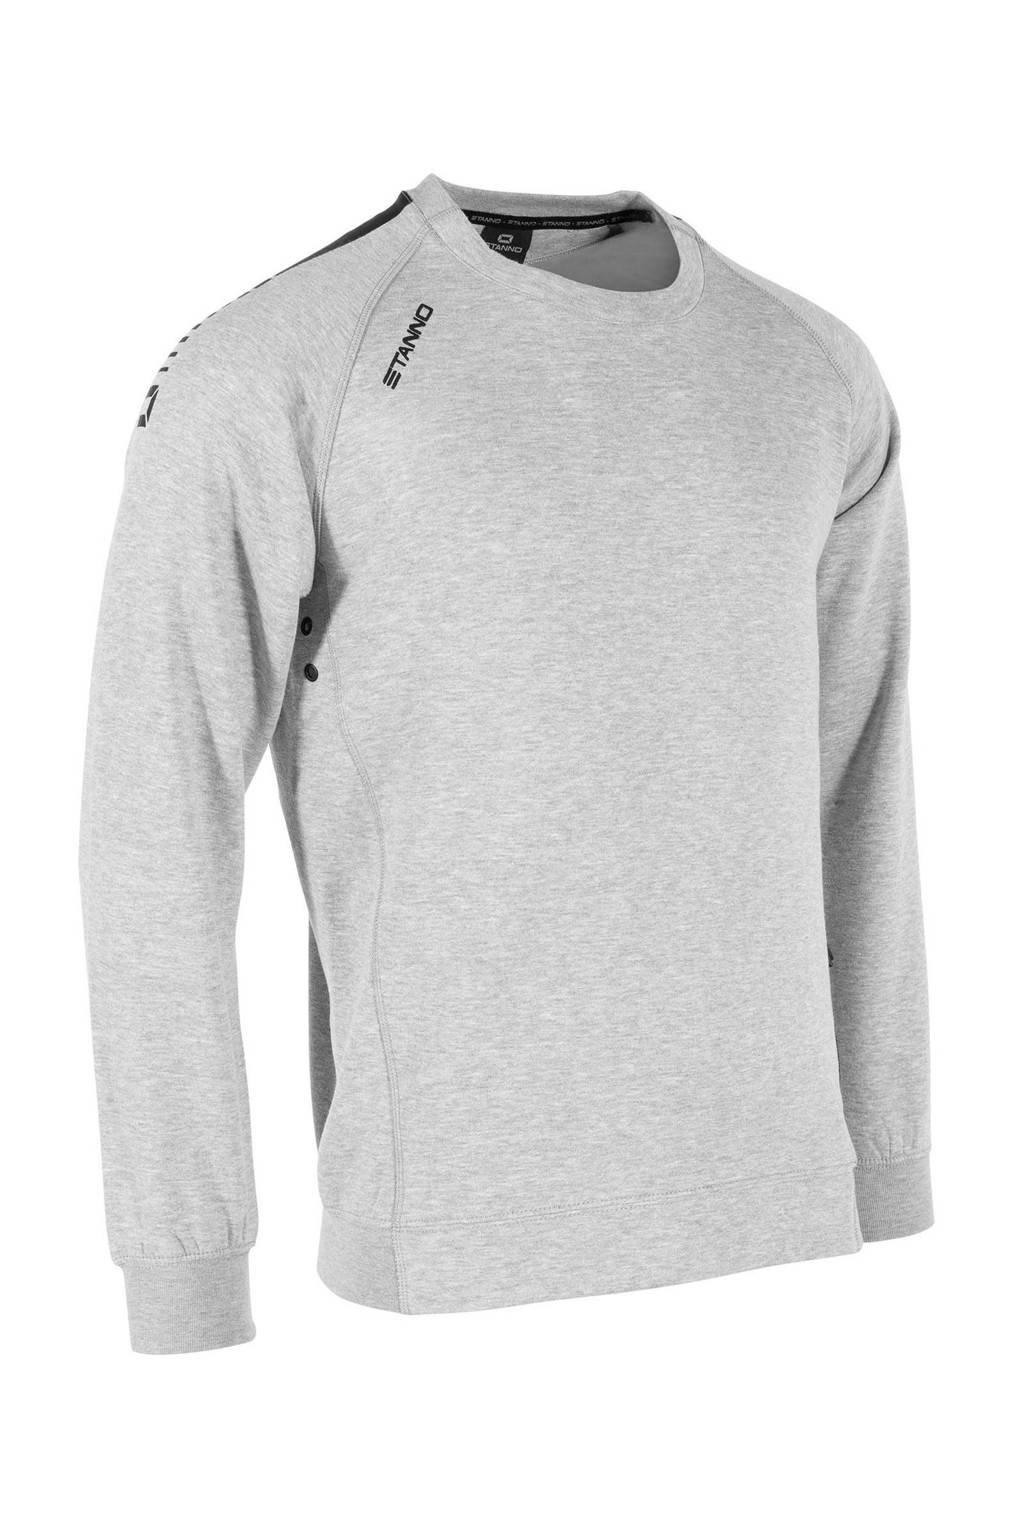 Stanno Senior  sportsweater grijs melange, Grijs melange